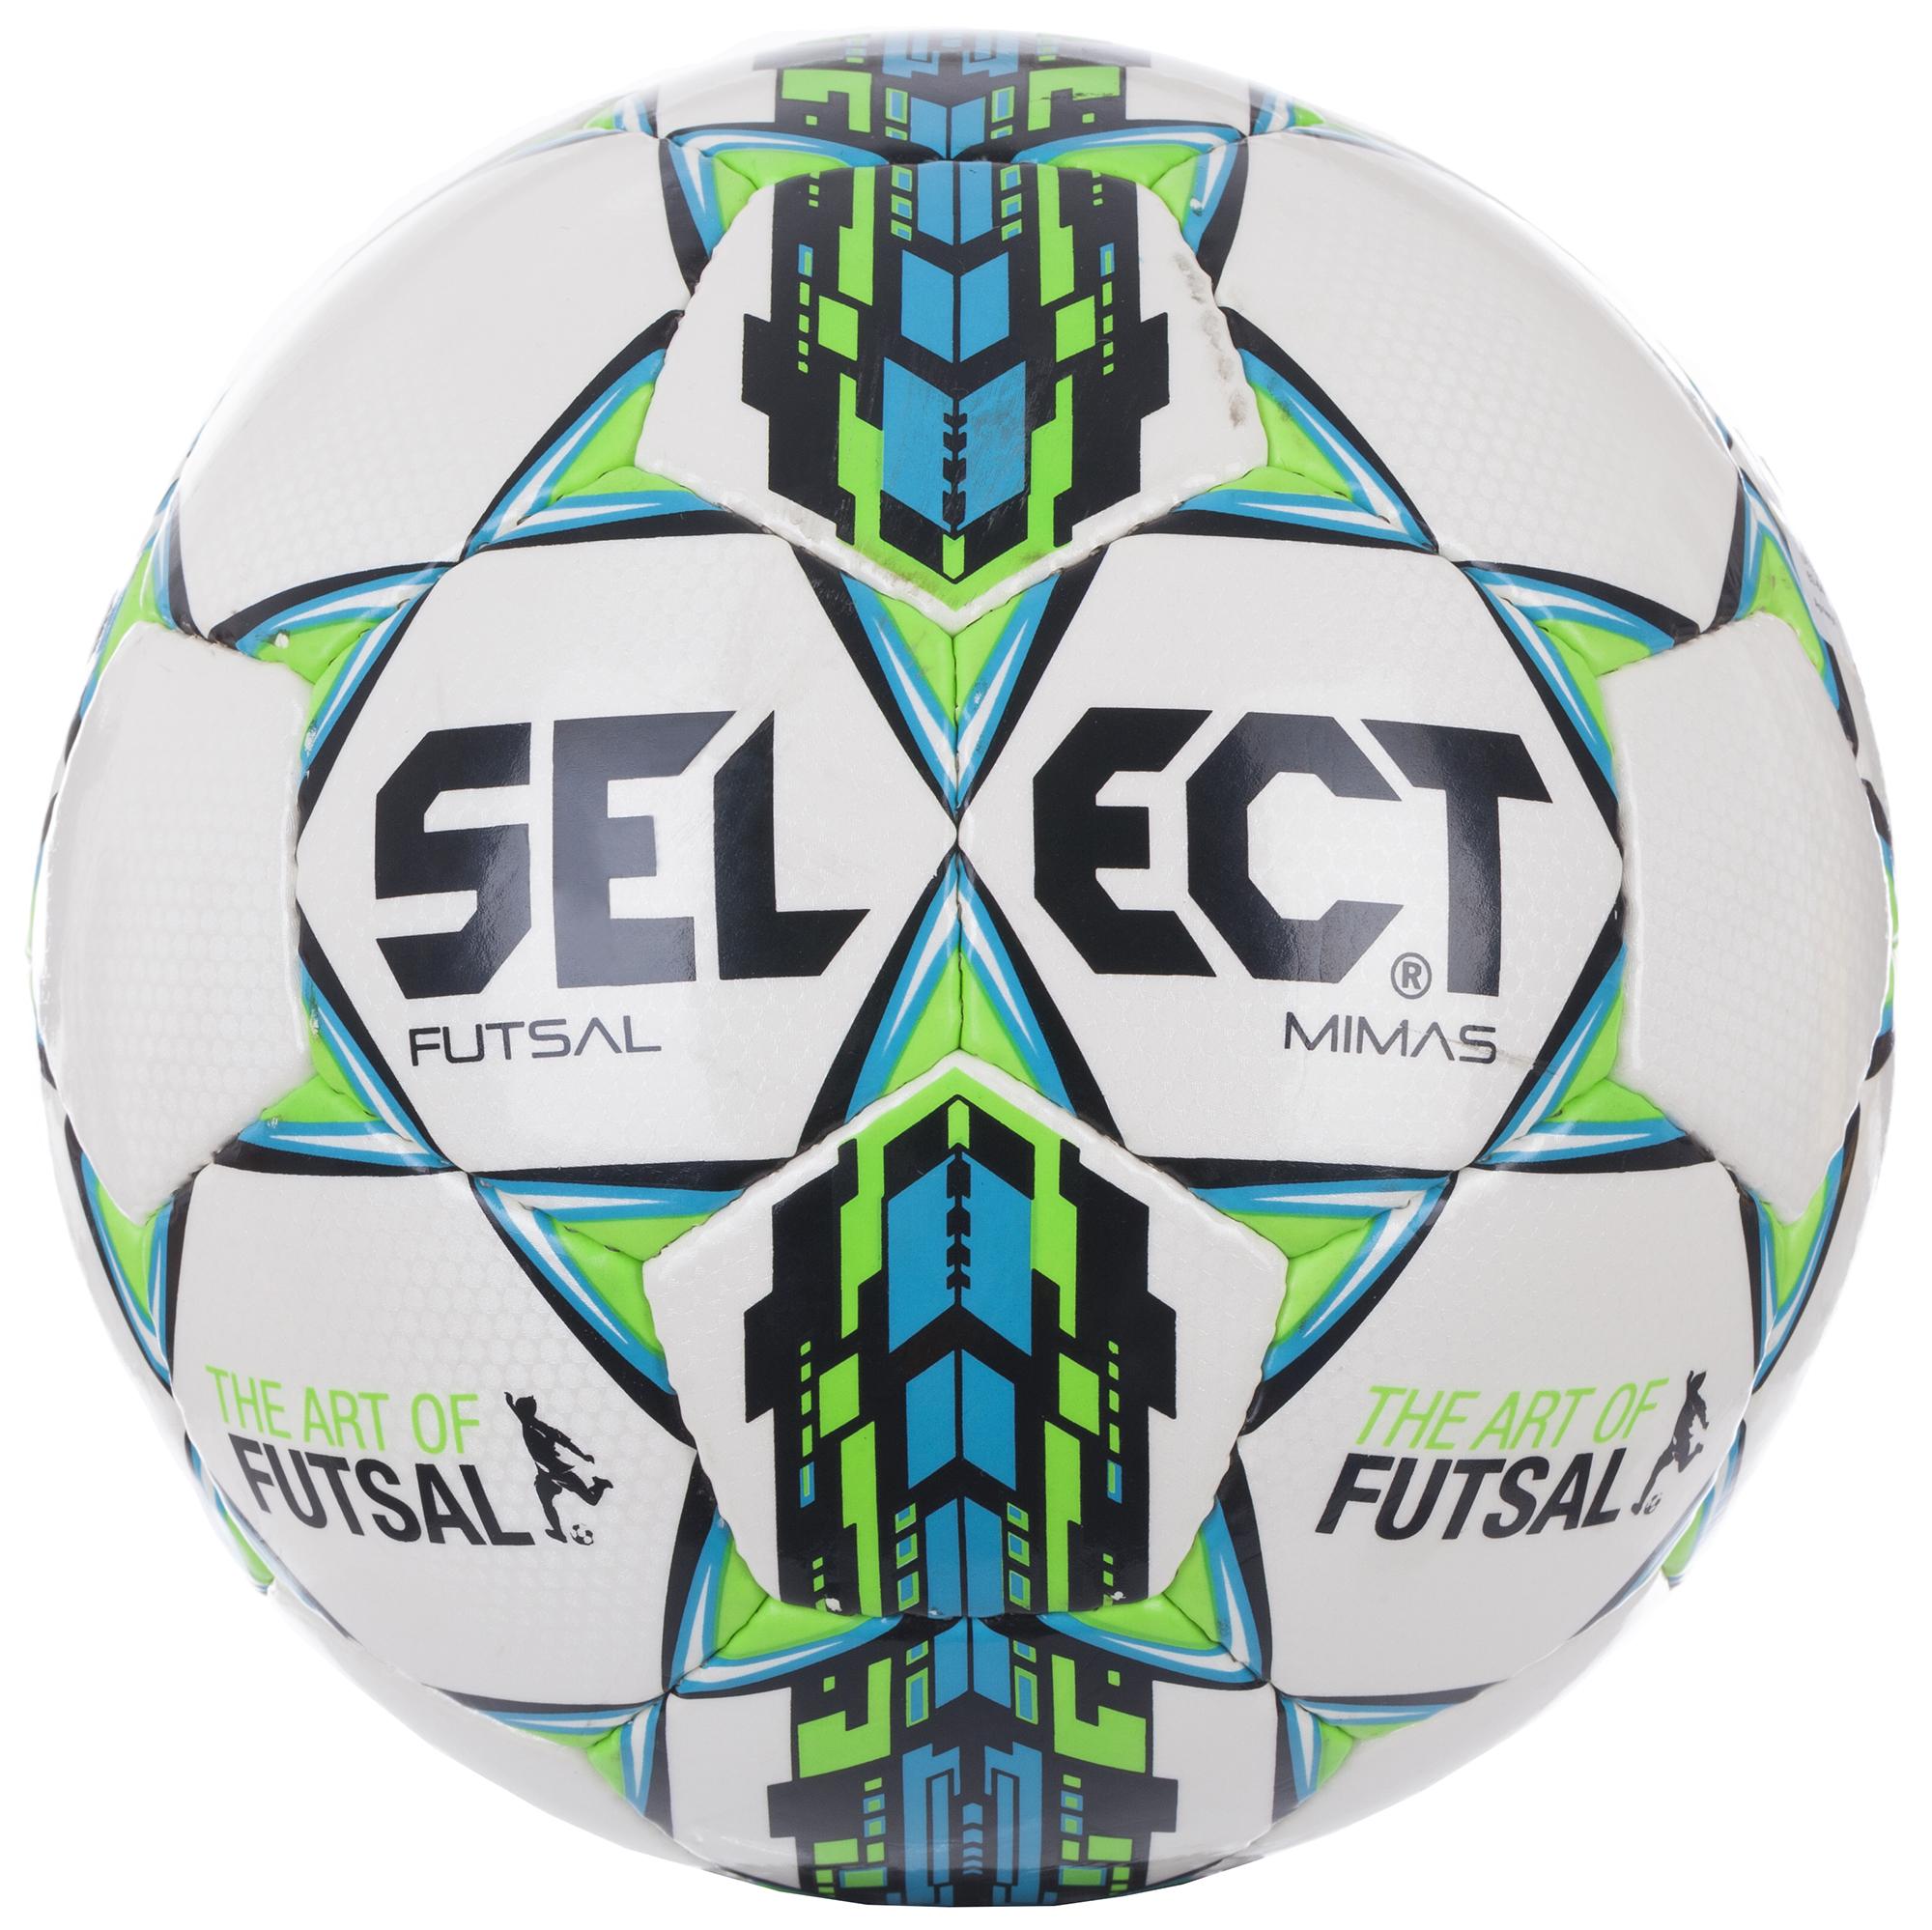 Select Мяч футбольный Select Futsal Mimas